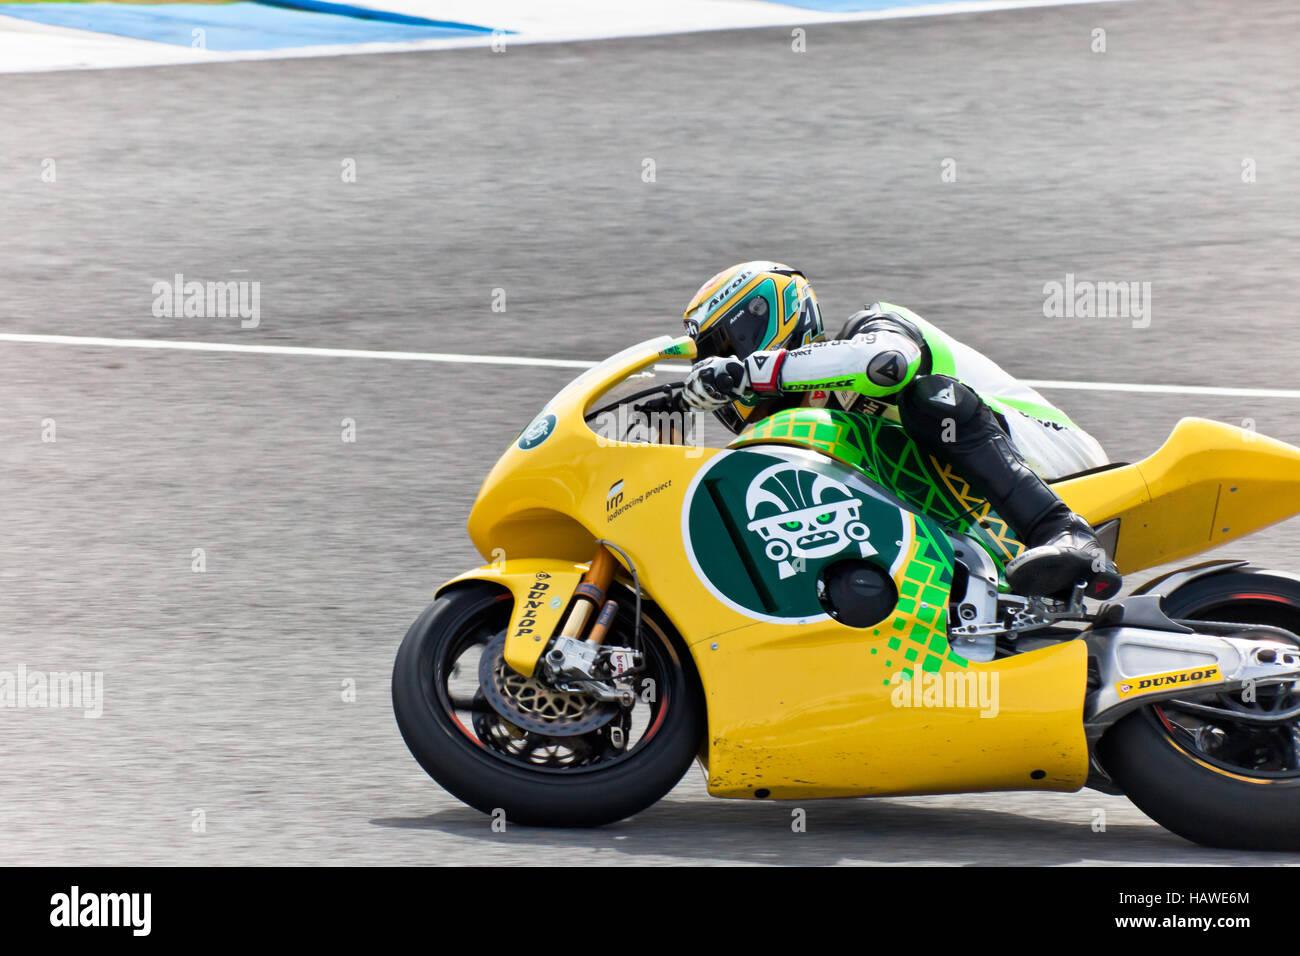 Simone Corsi pilot of Moto2  of the MotoGP - Stock Image